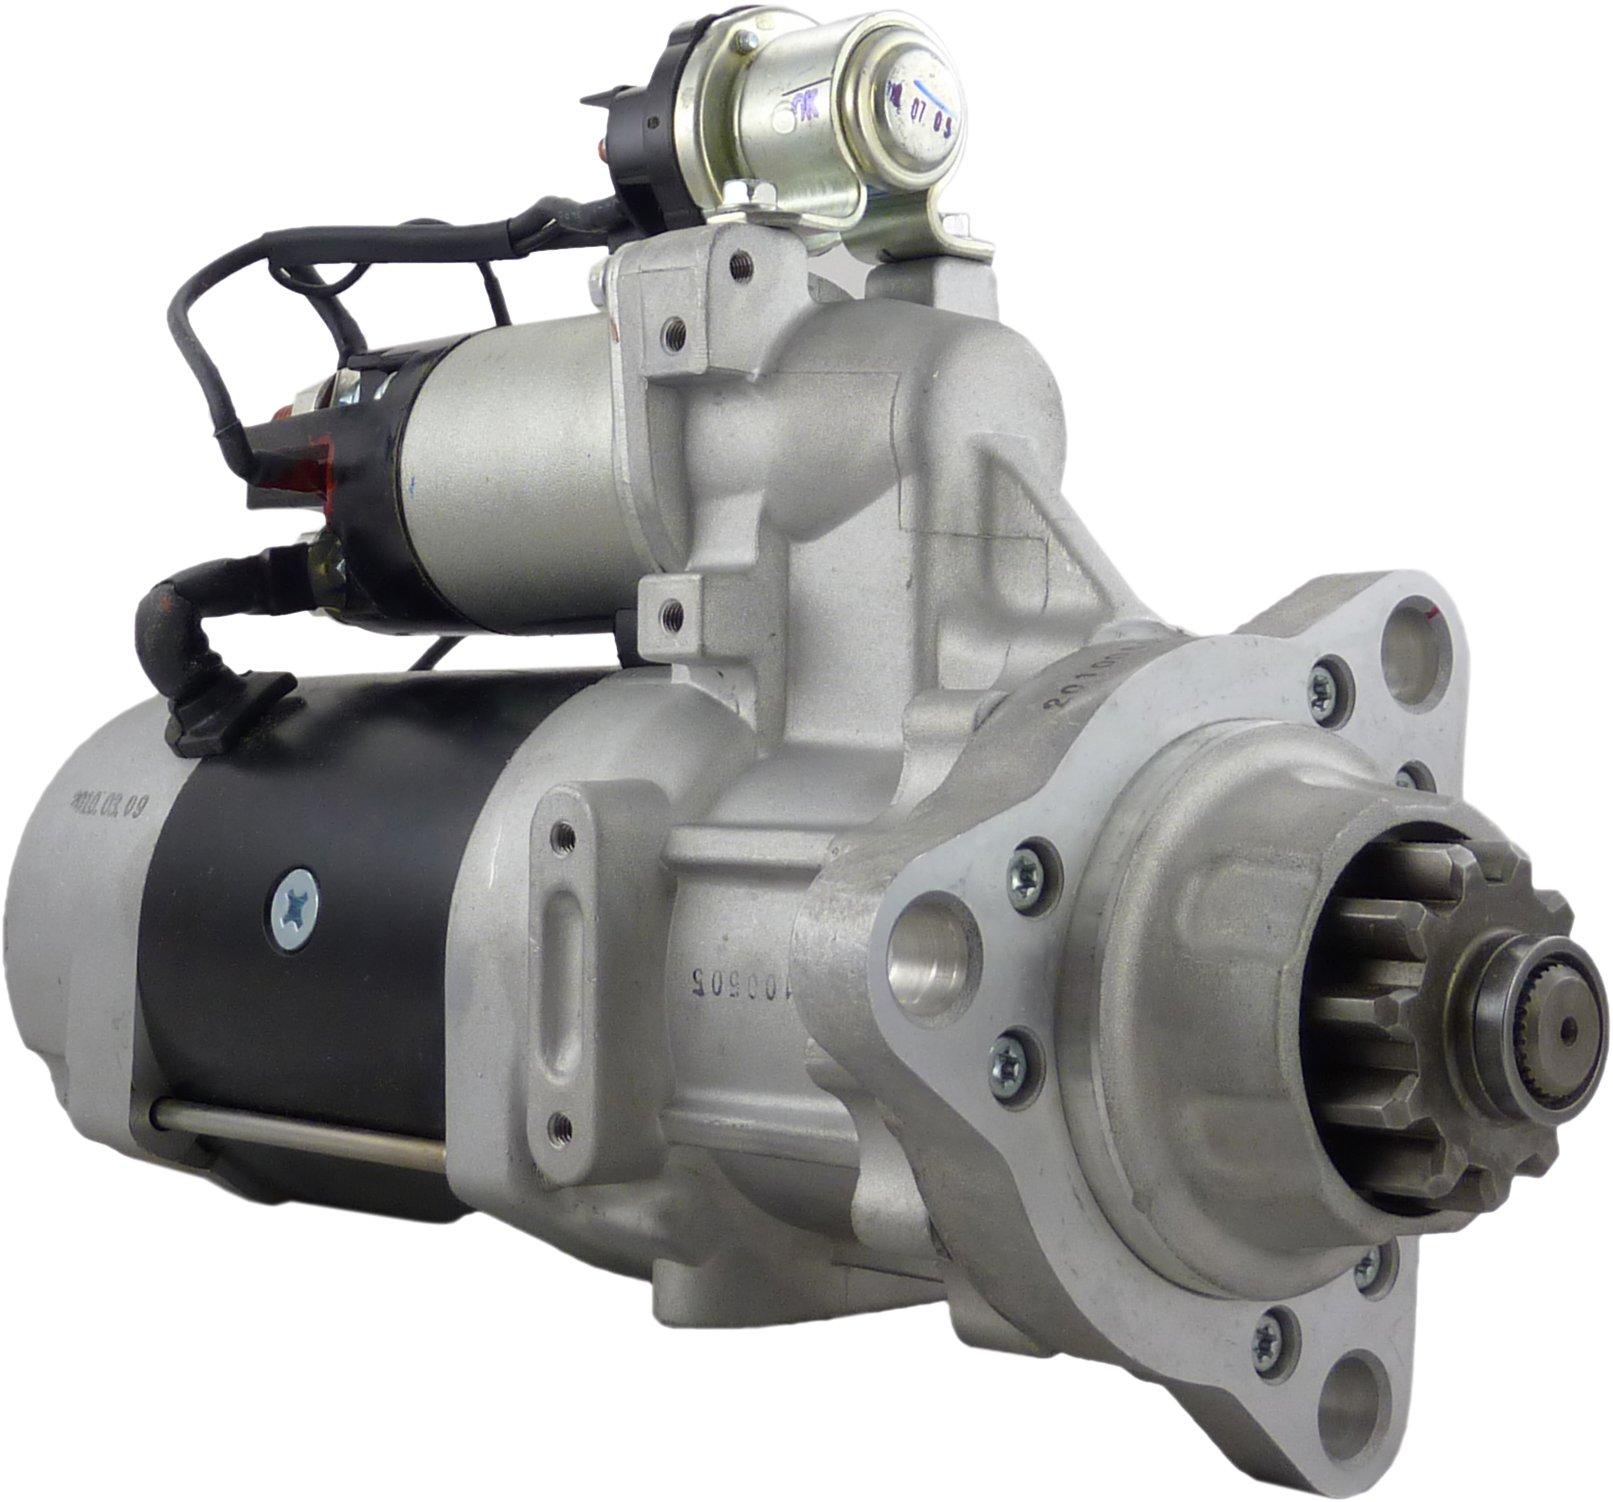 39MT Starter 82000308 rotatable HD FL579 428000-5730 19011529 6924 by URQS